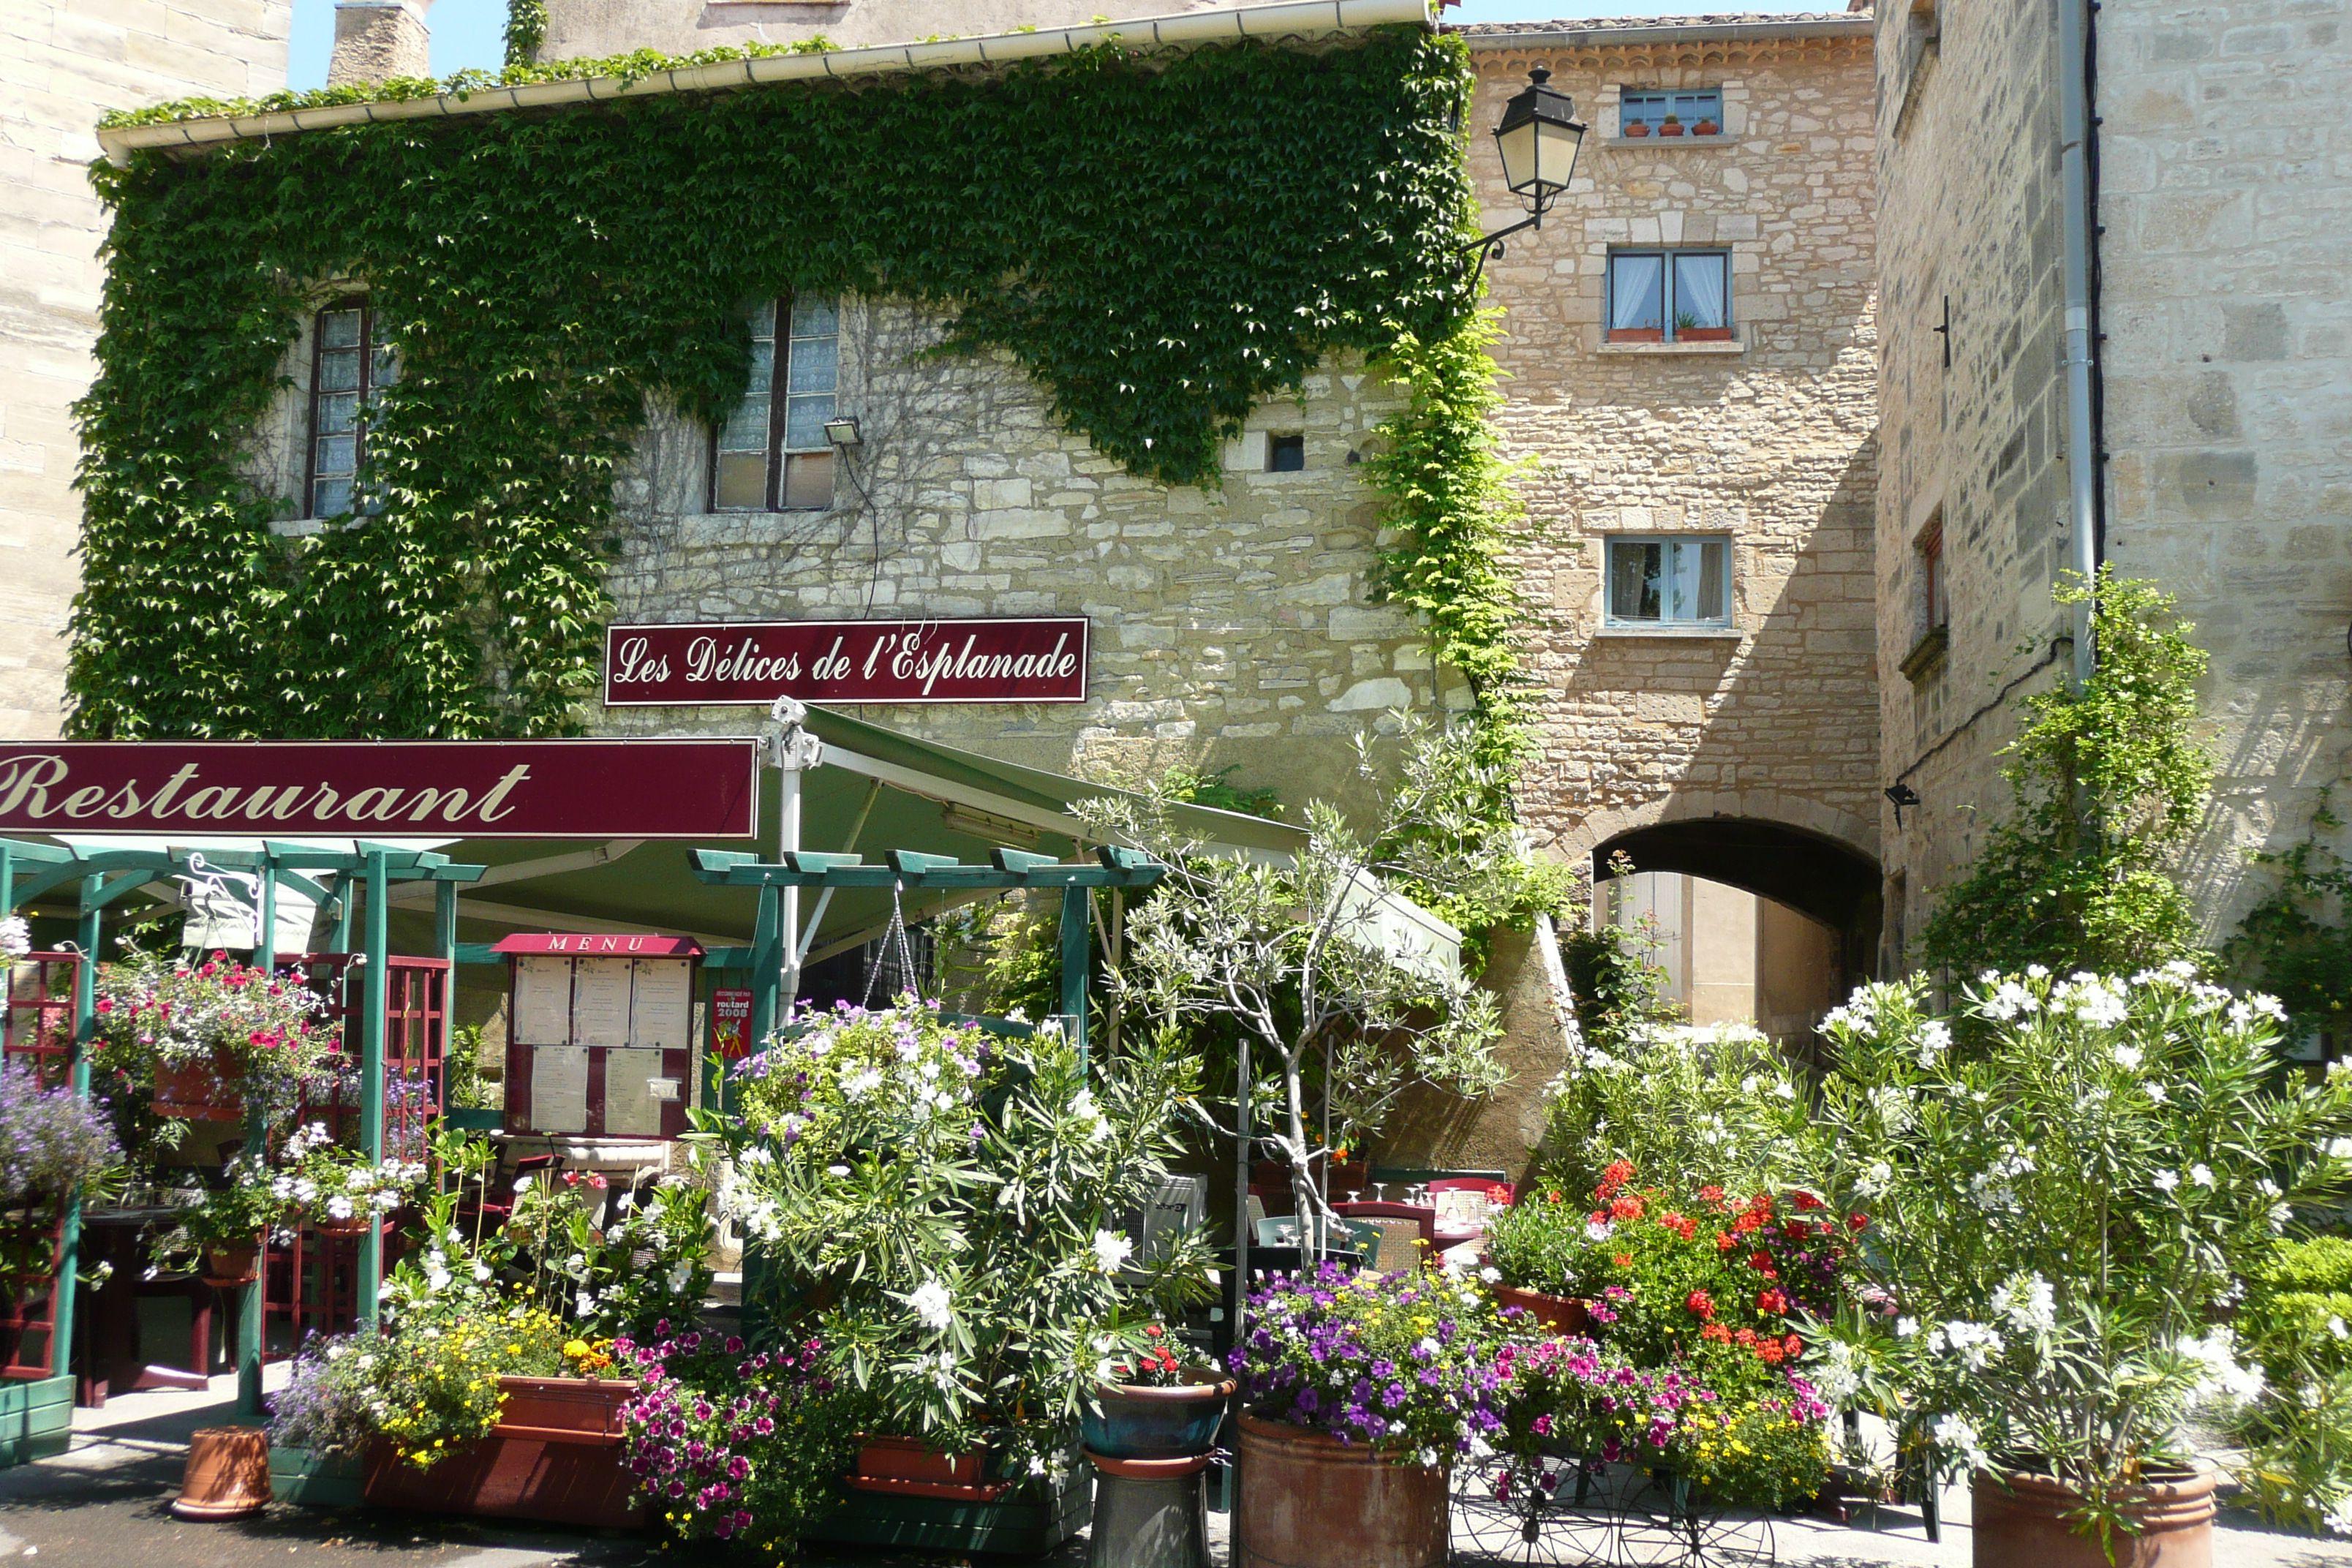 Restaurant bien fleuri à Barjac, Gard, Provence, France. | La France ...